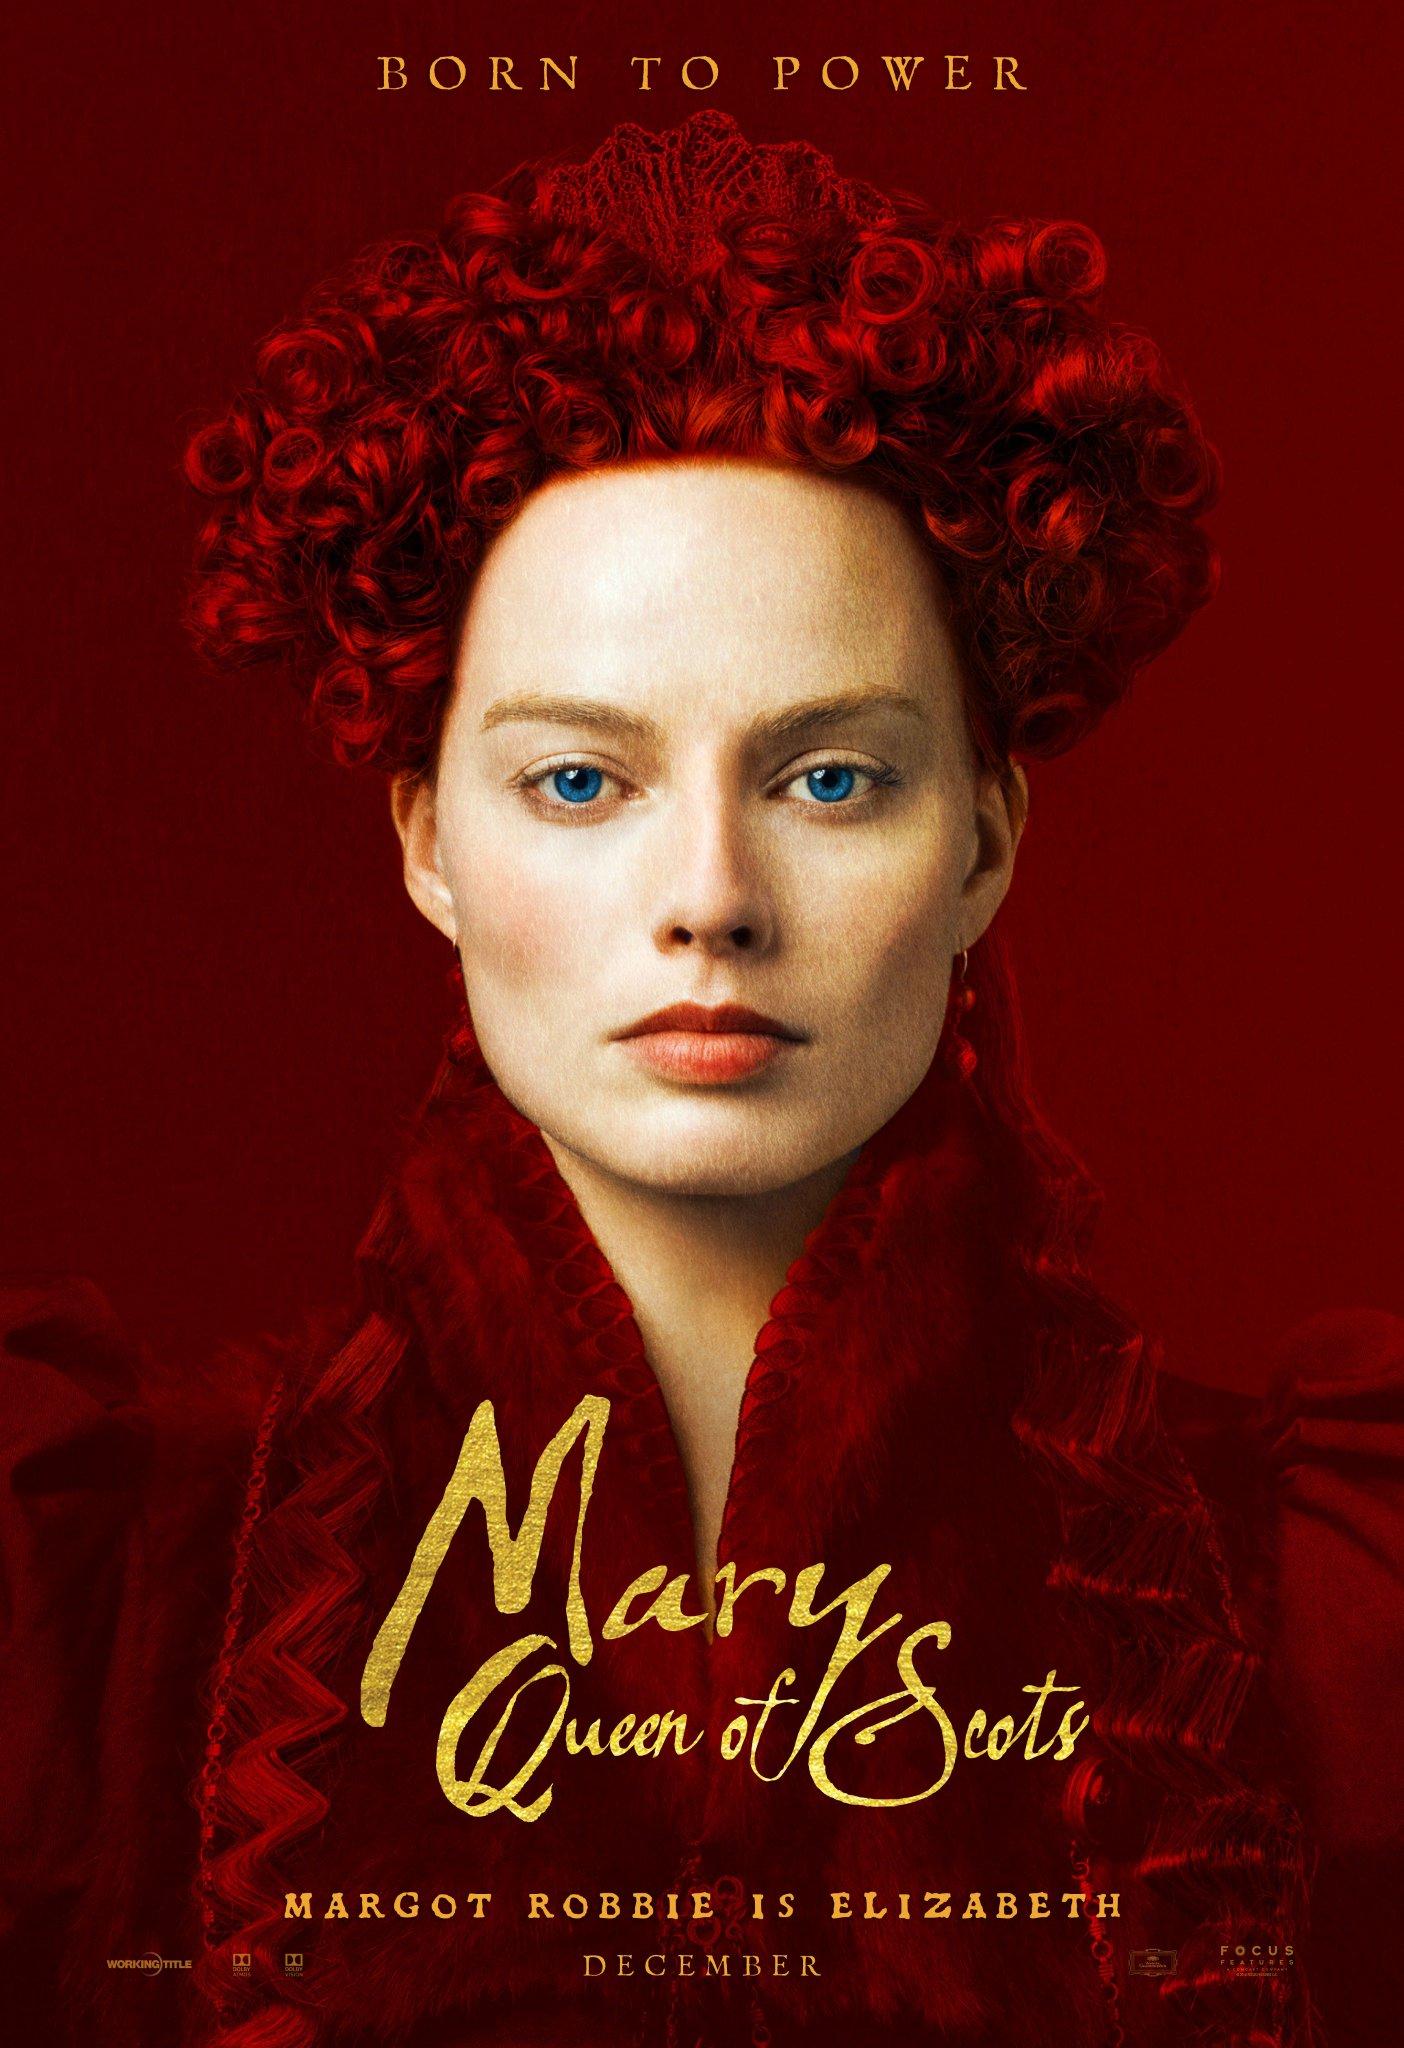 Get the first look at Margot Robbie and Saoirse Ronan in the #MaryQueenofScots trailer, tonight on ET! https://t.co/CPdzuRHkZ5